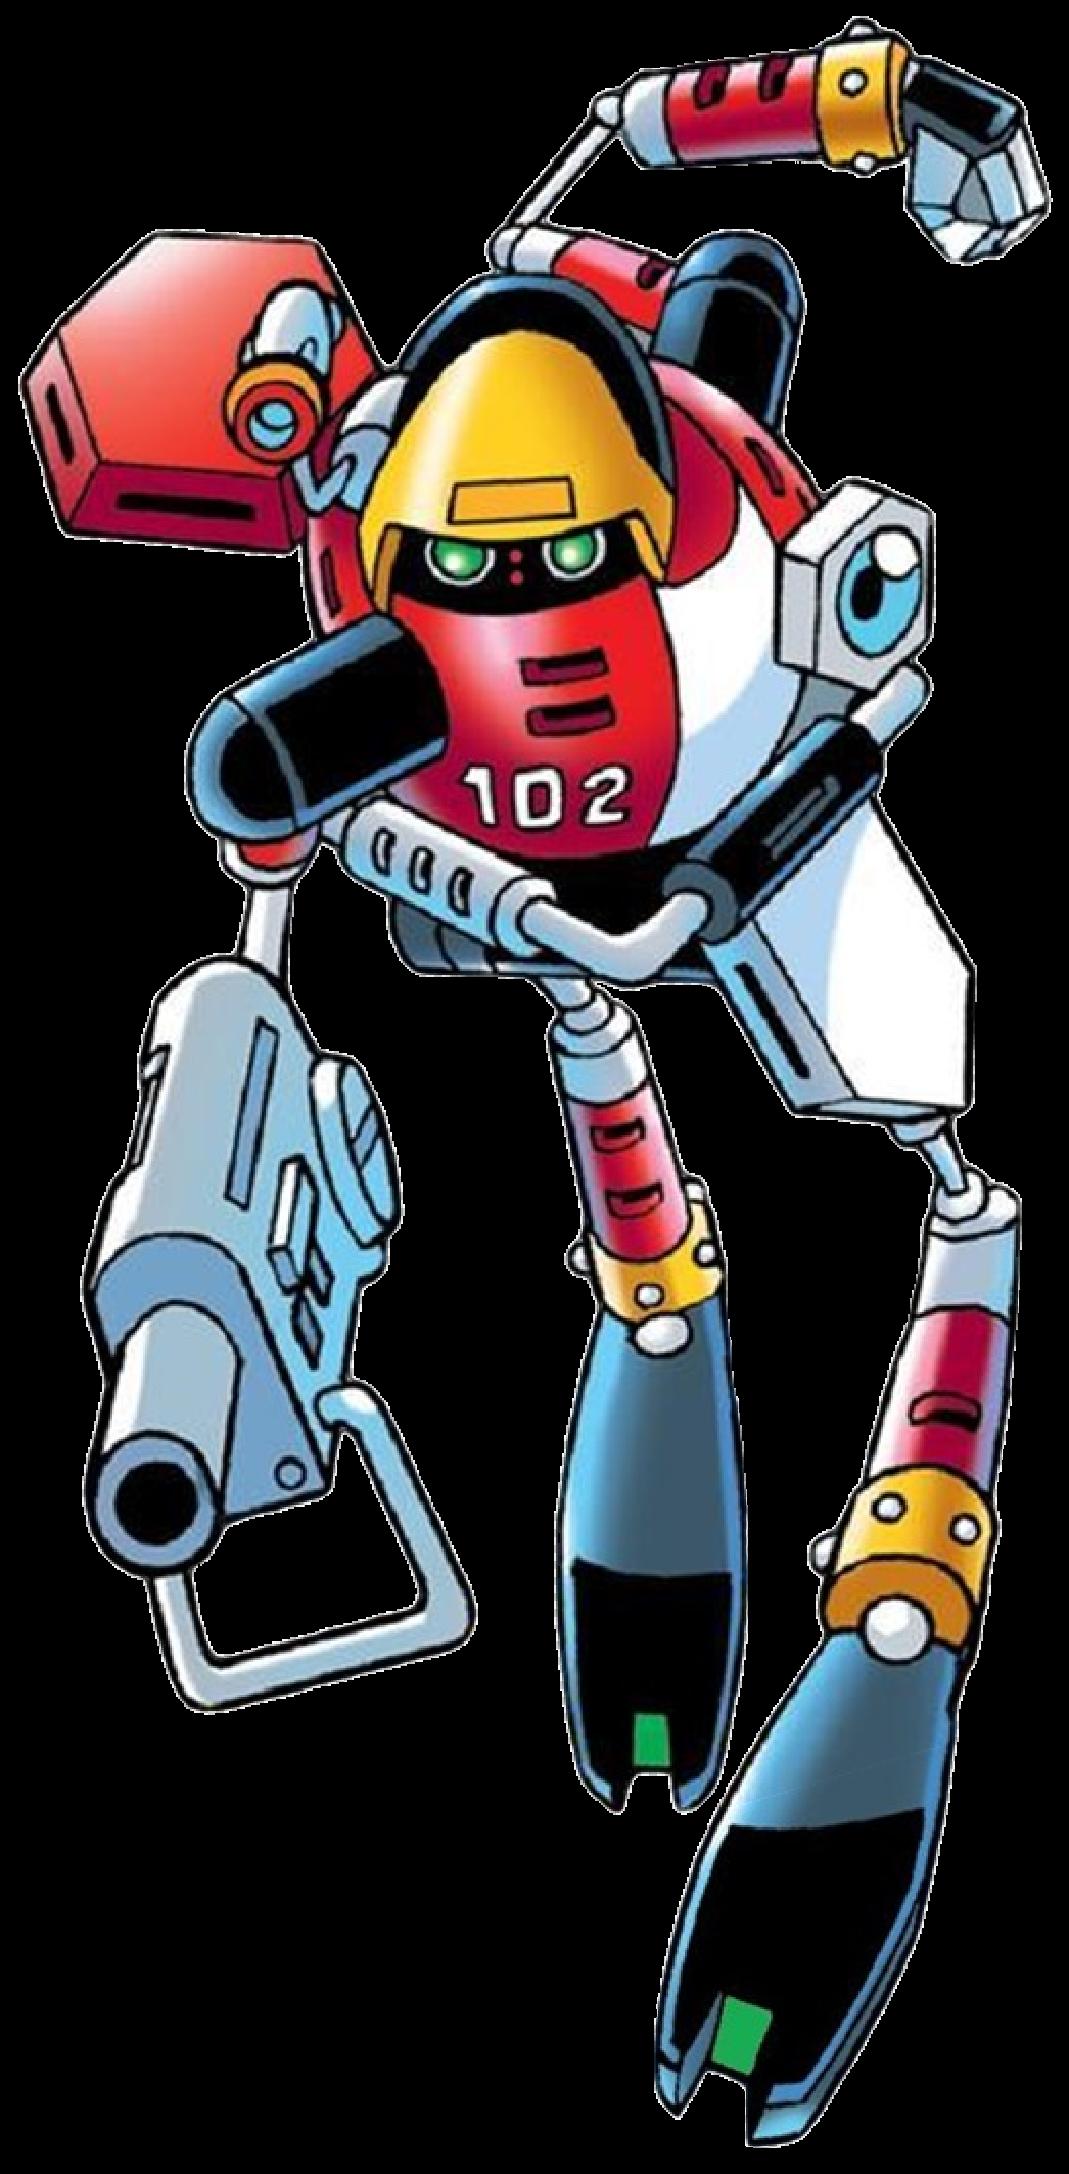 E-102 Gamma (Pre-Super Genesis Wave) | Sonic News Network | Fandom powered by Wikia